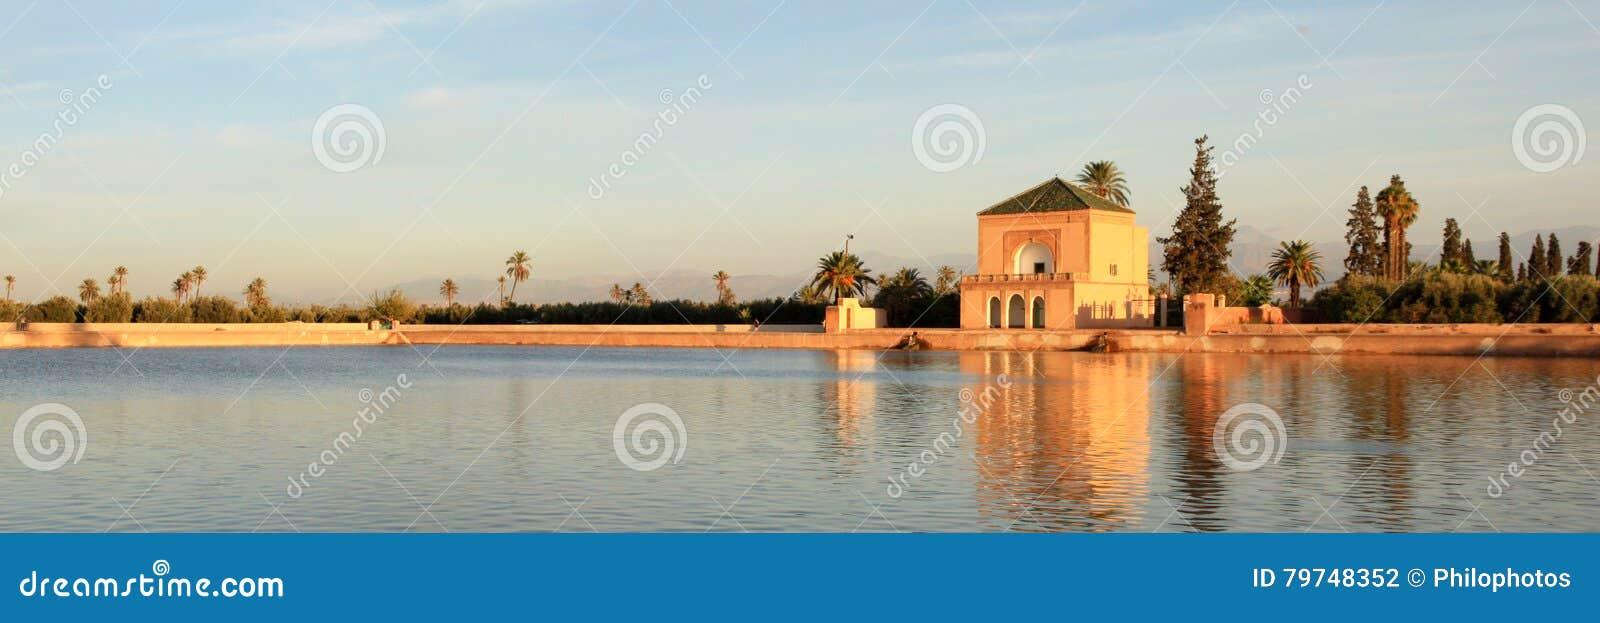 África - Marruecos - Marrakesh